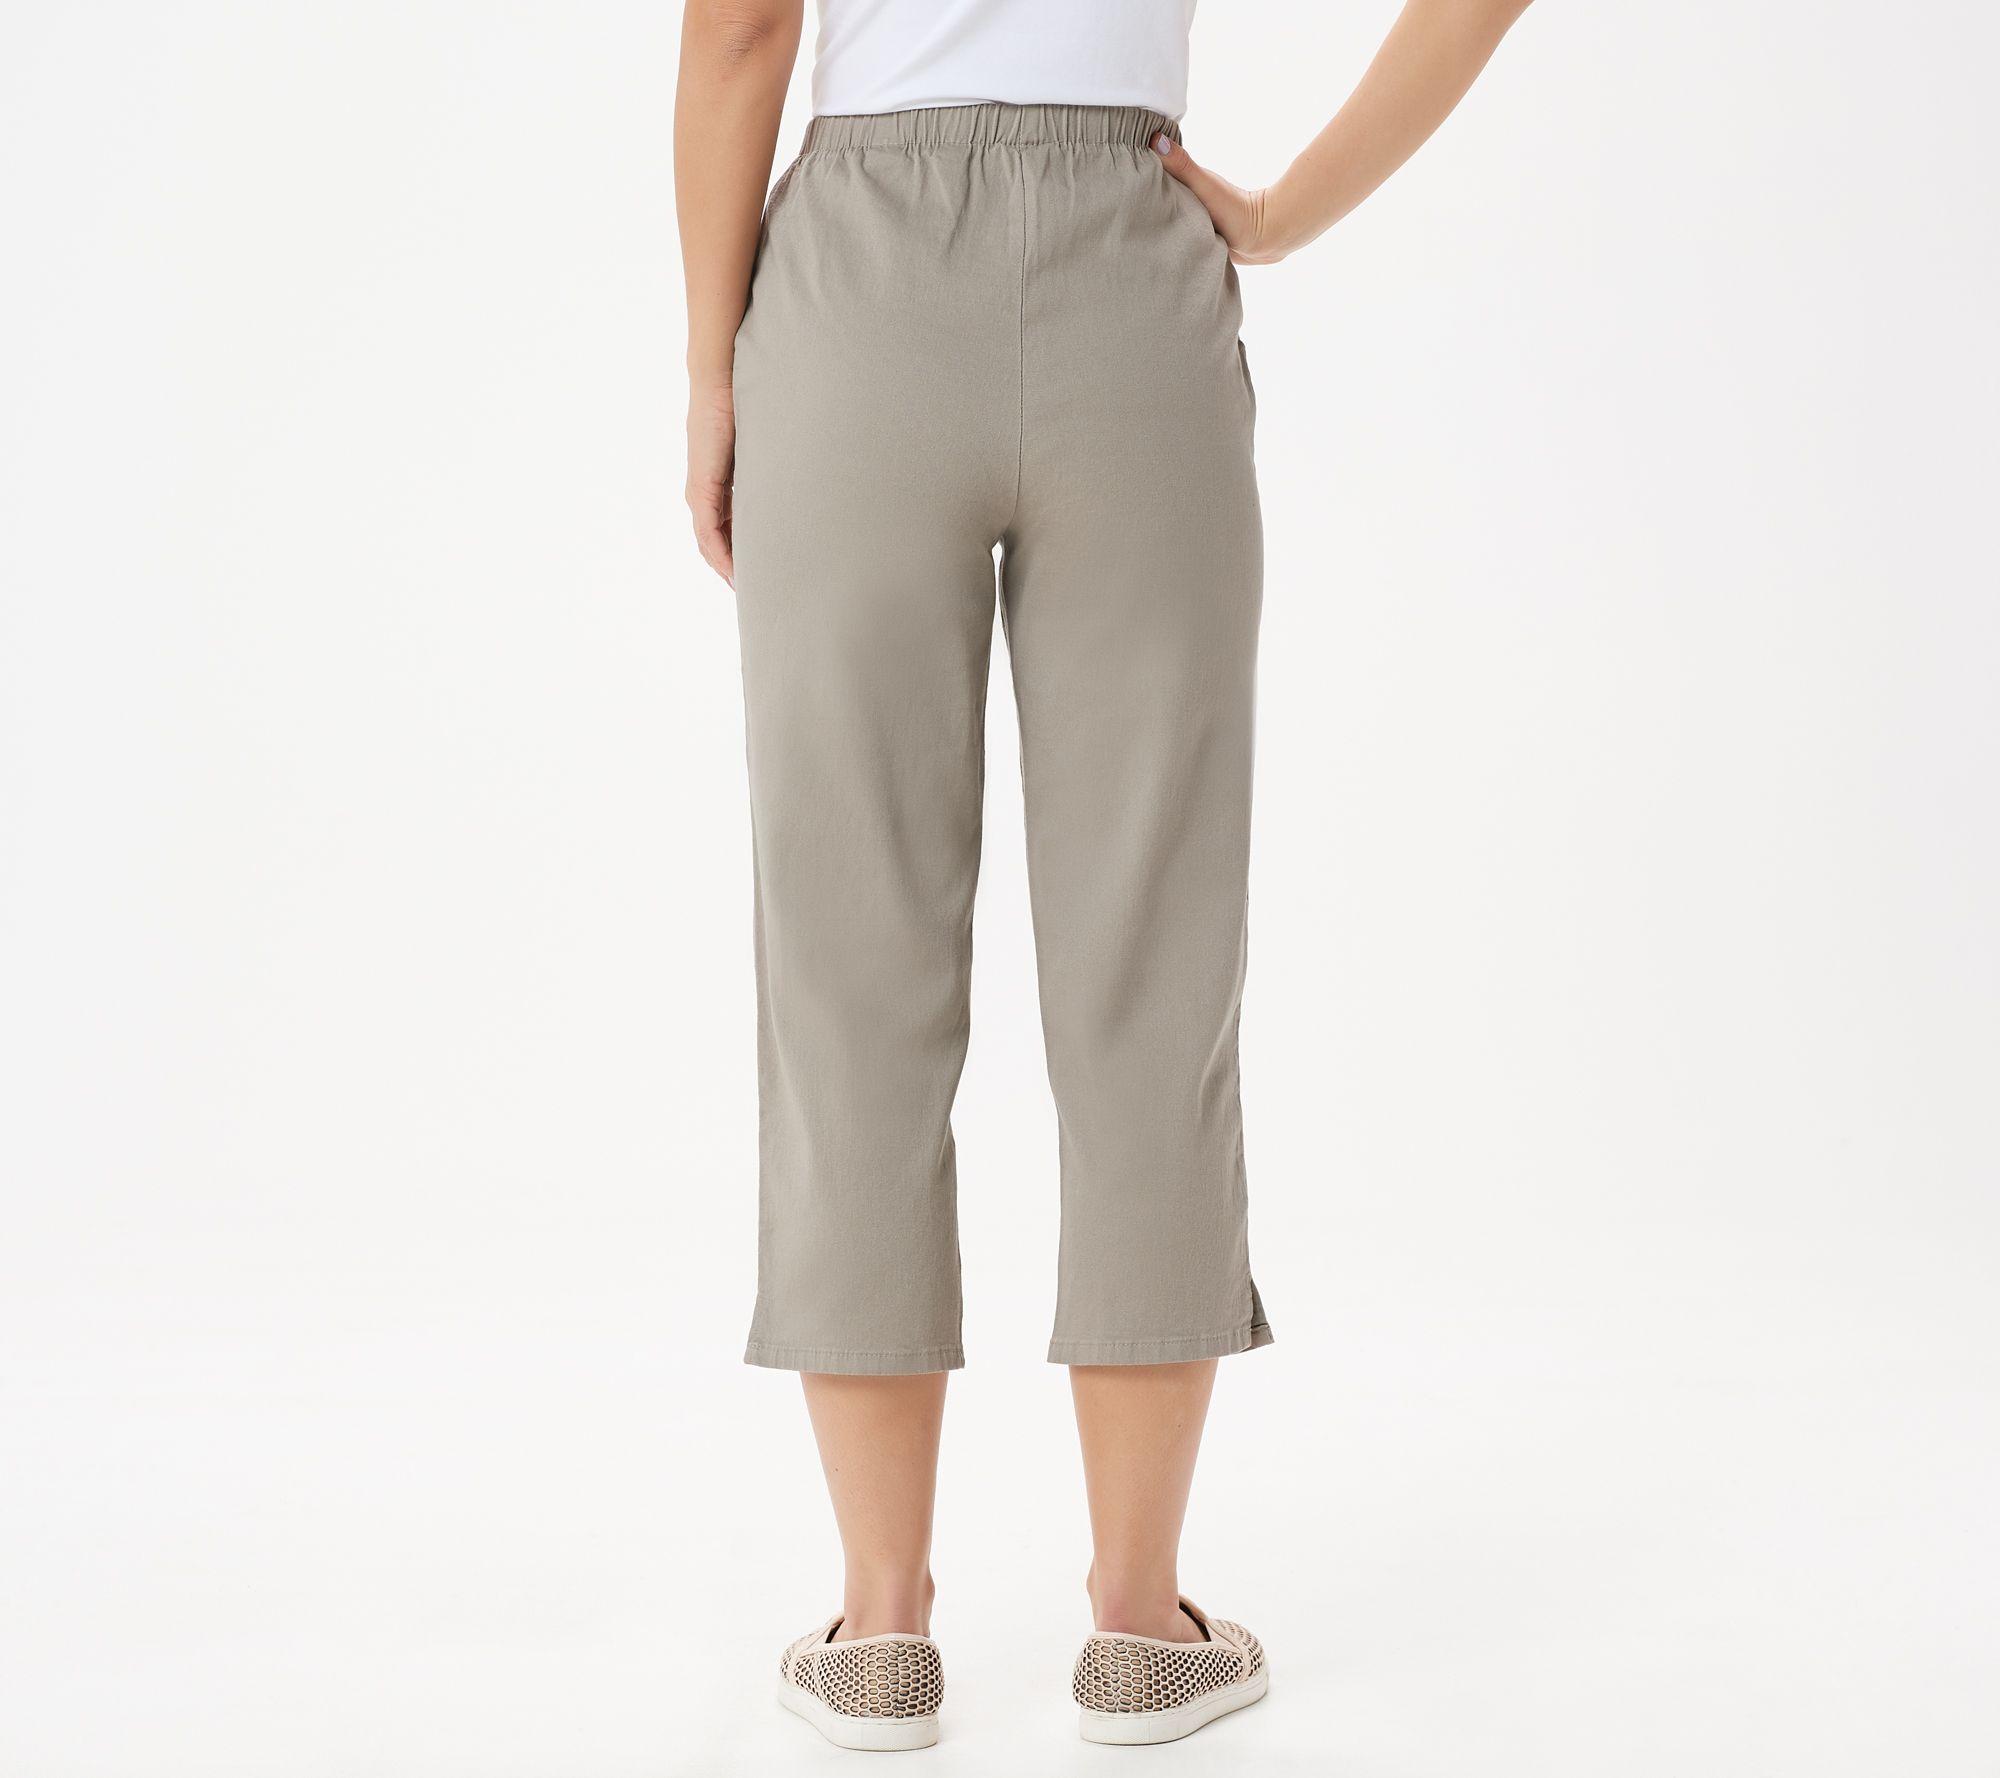 Highway 1 100/% Cotton Drawstring Elastic Waistband Shorts Spruce